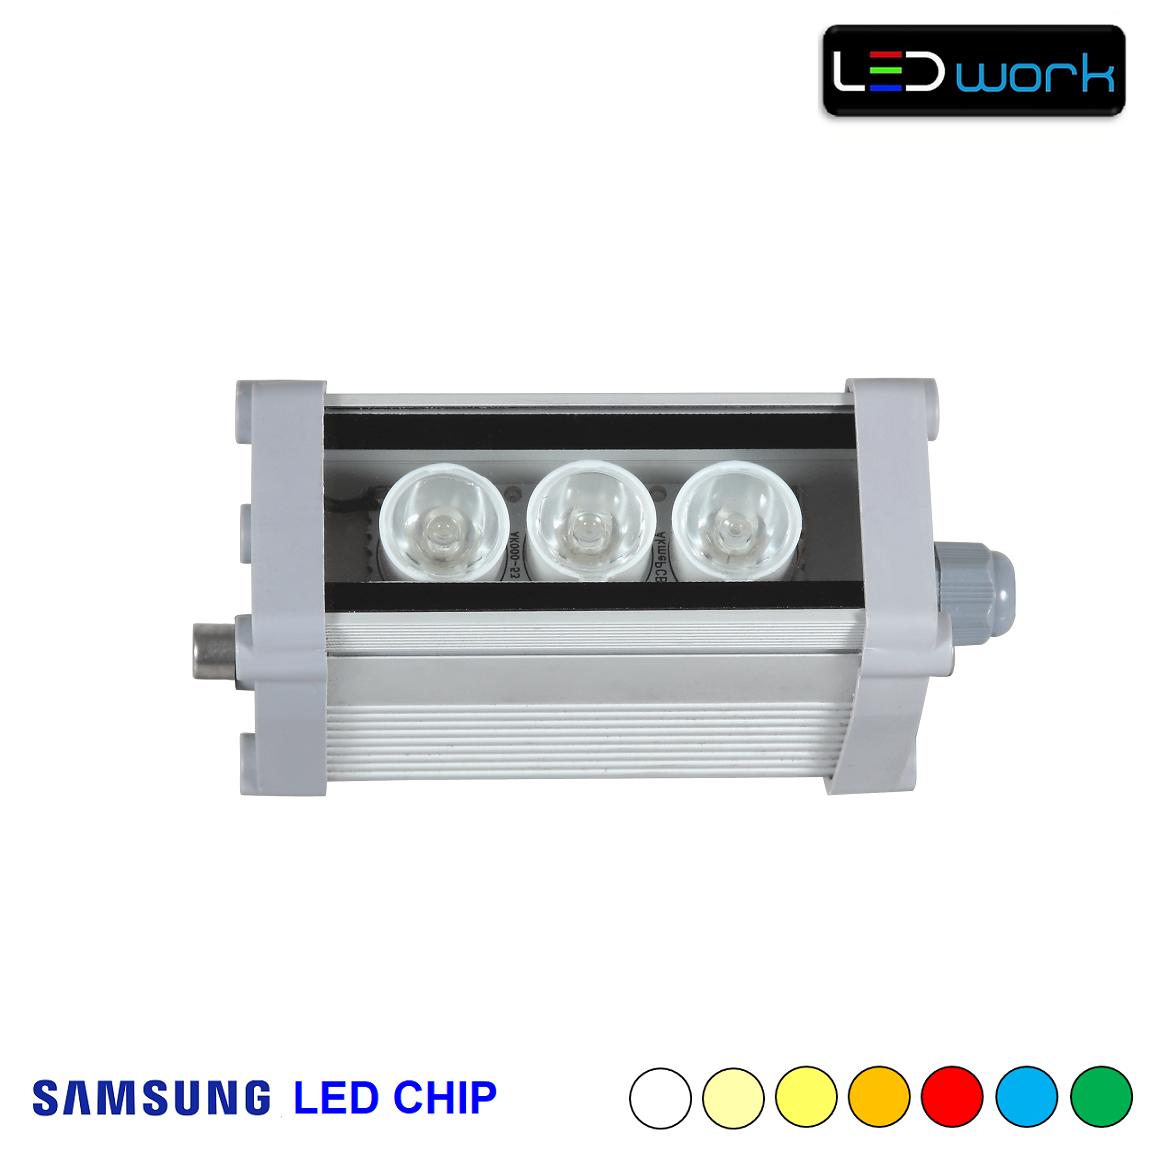 12 cm 3 Watt SAMSUNG LED Chip Sıva Üstü Wallwasher